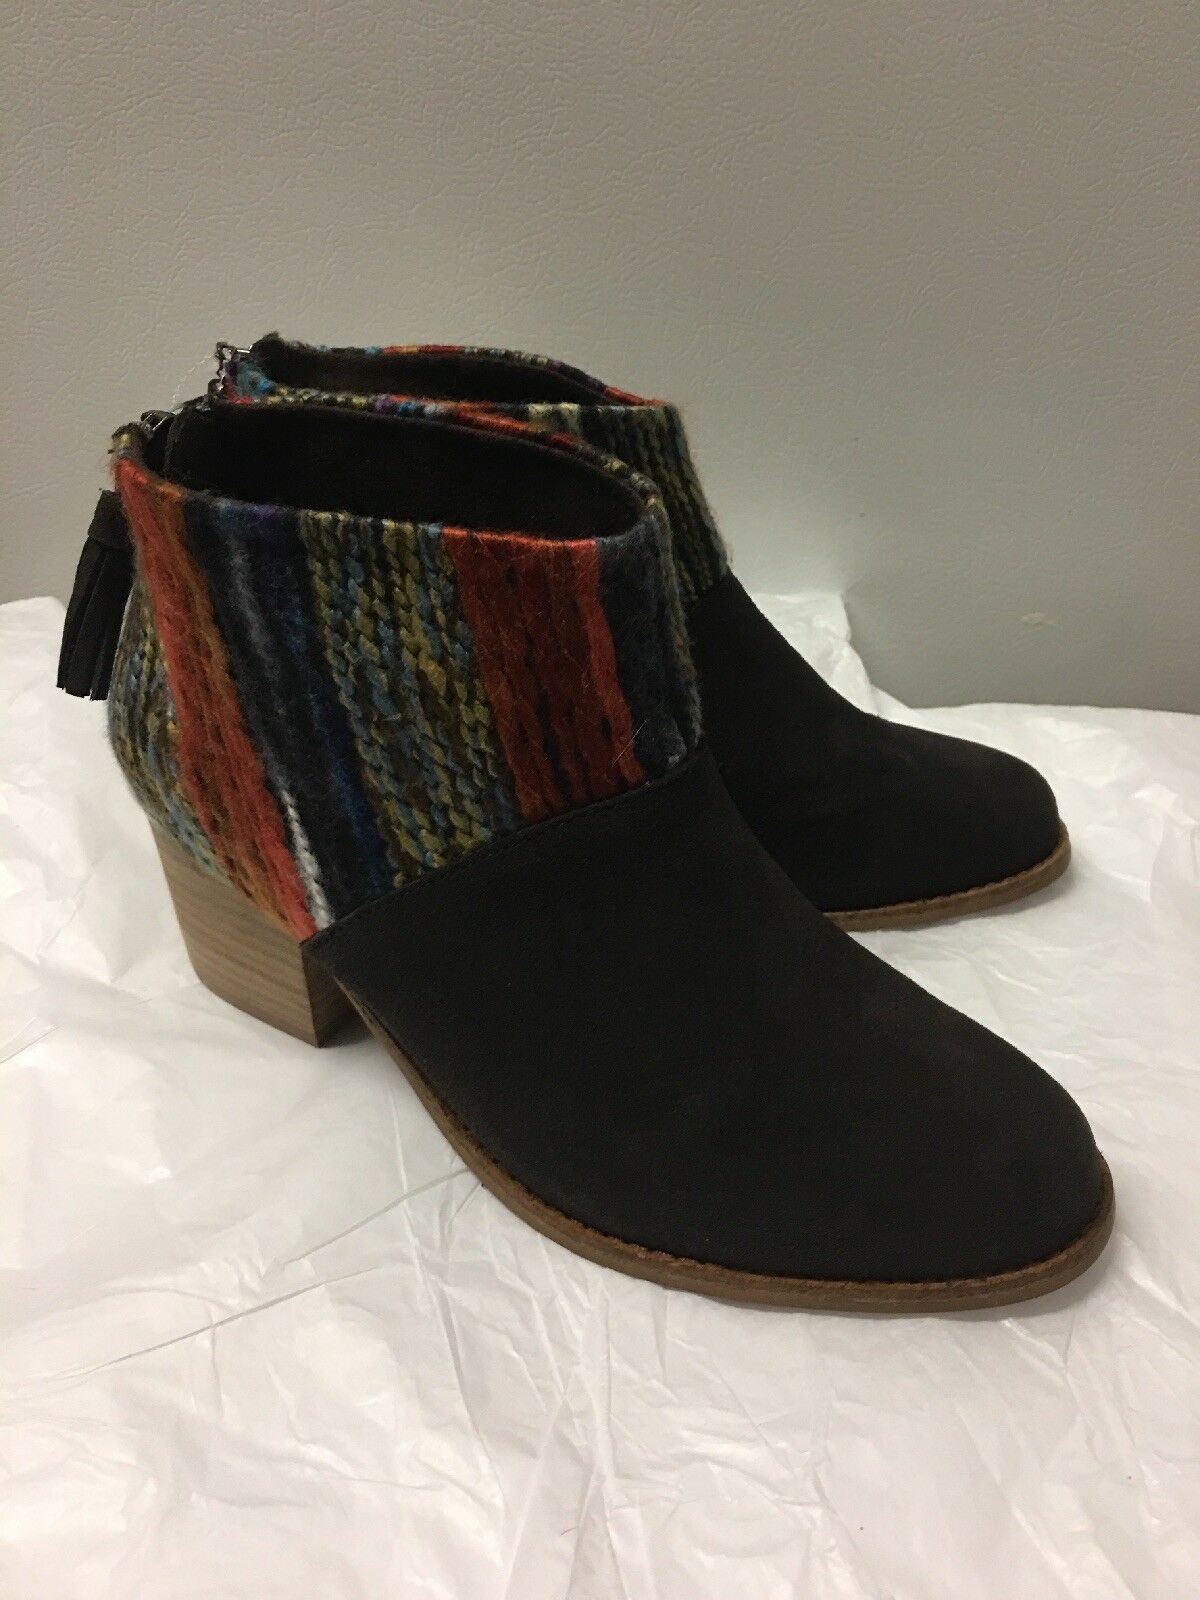 TOMS Heel Leila Braun Suede Farbeful Yarn Knit Bootie Boot Heel TOMS Boho Hippy 8 1faf2d